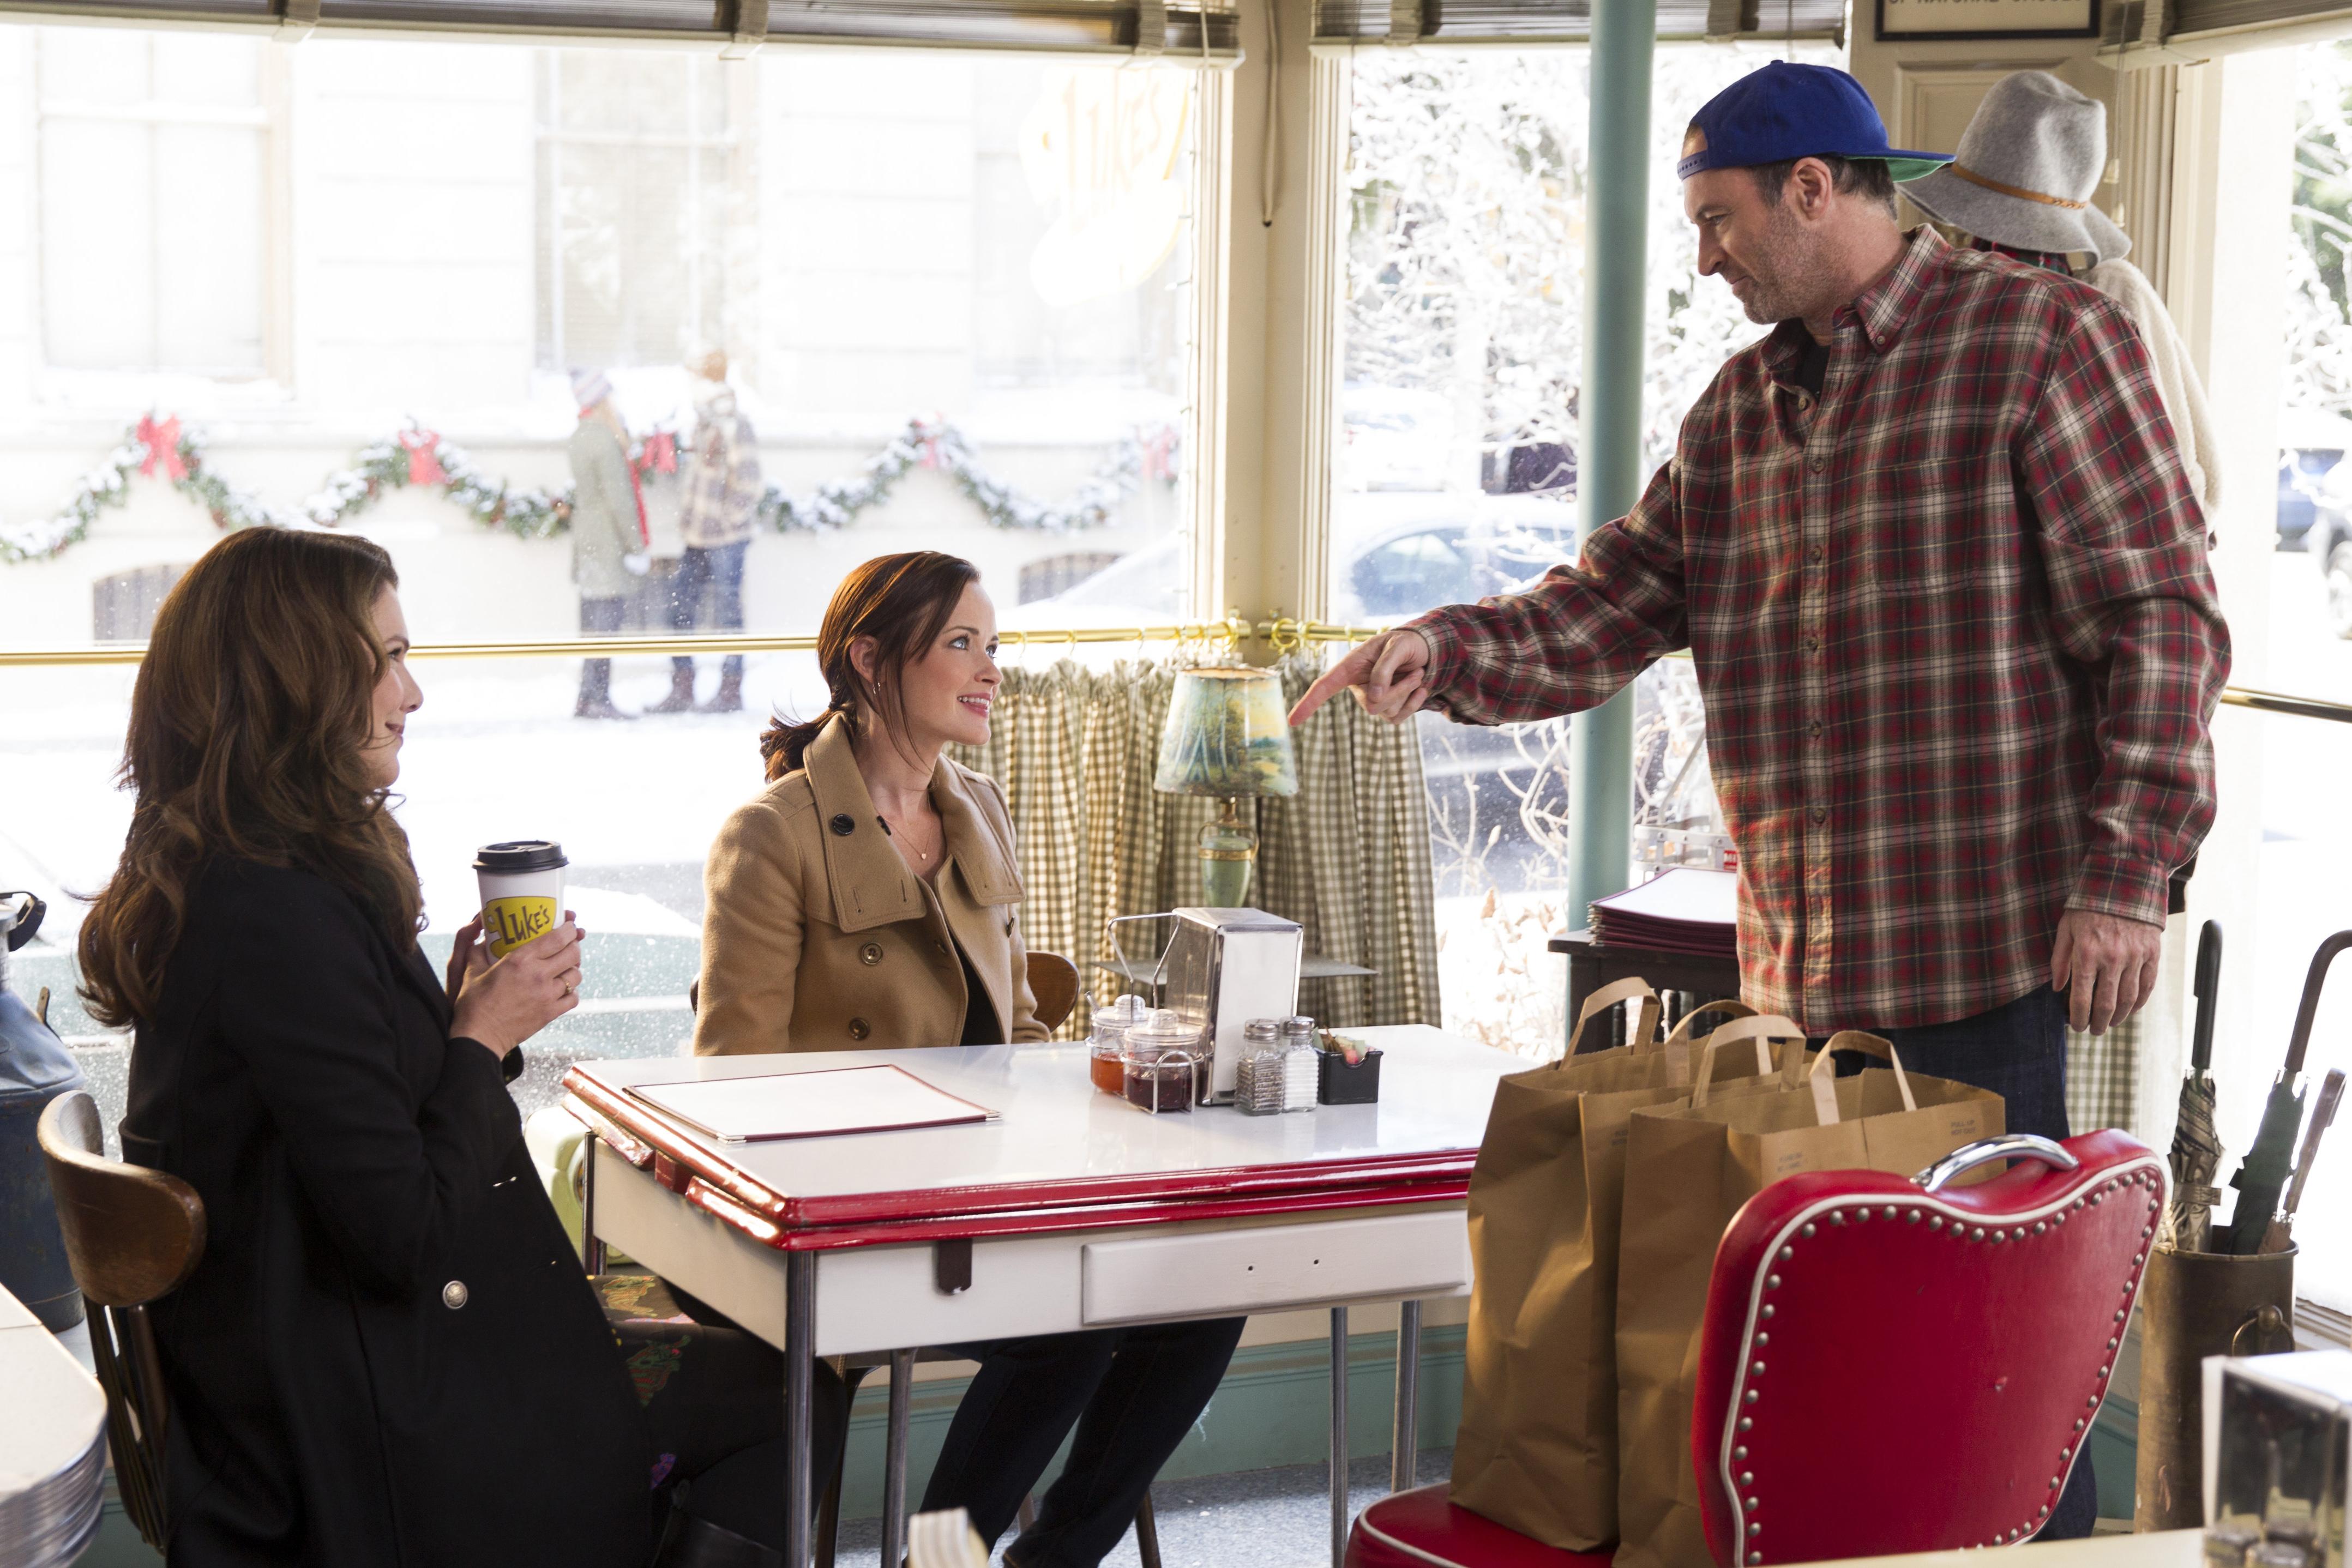 A Gilmore Girls scene at Luke's Diner, featuring Luke, Lorelai, and Rory.